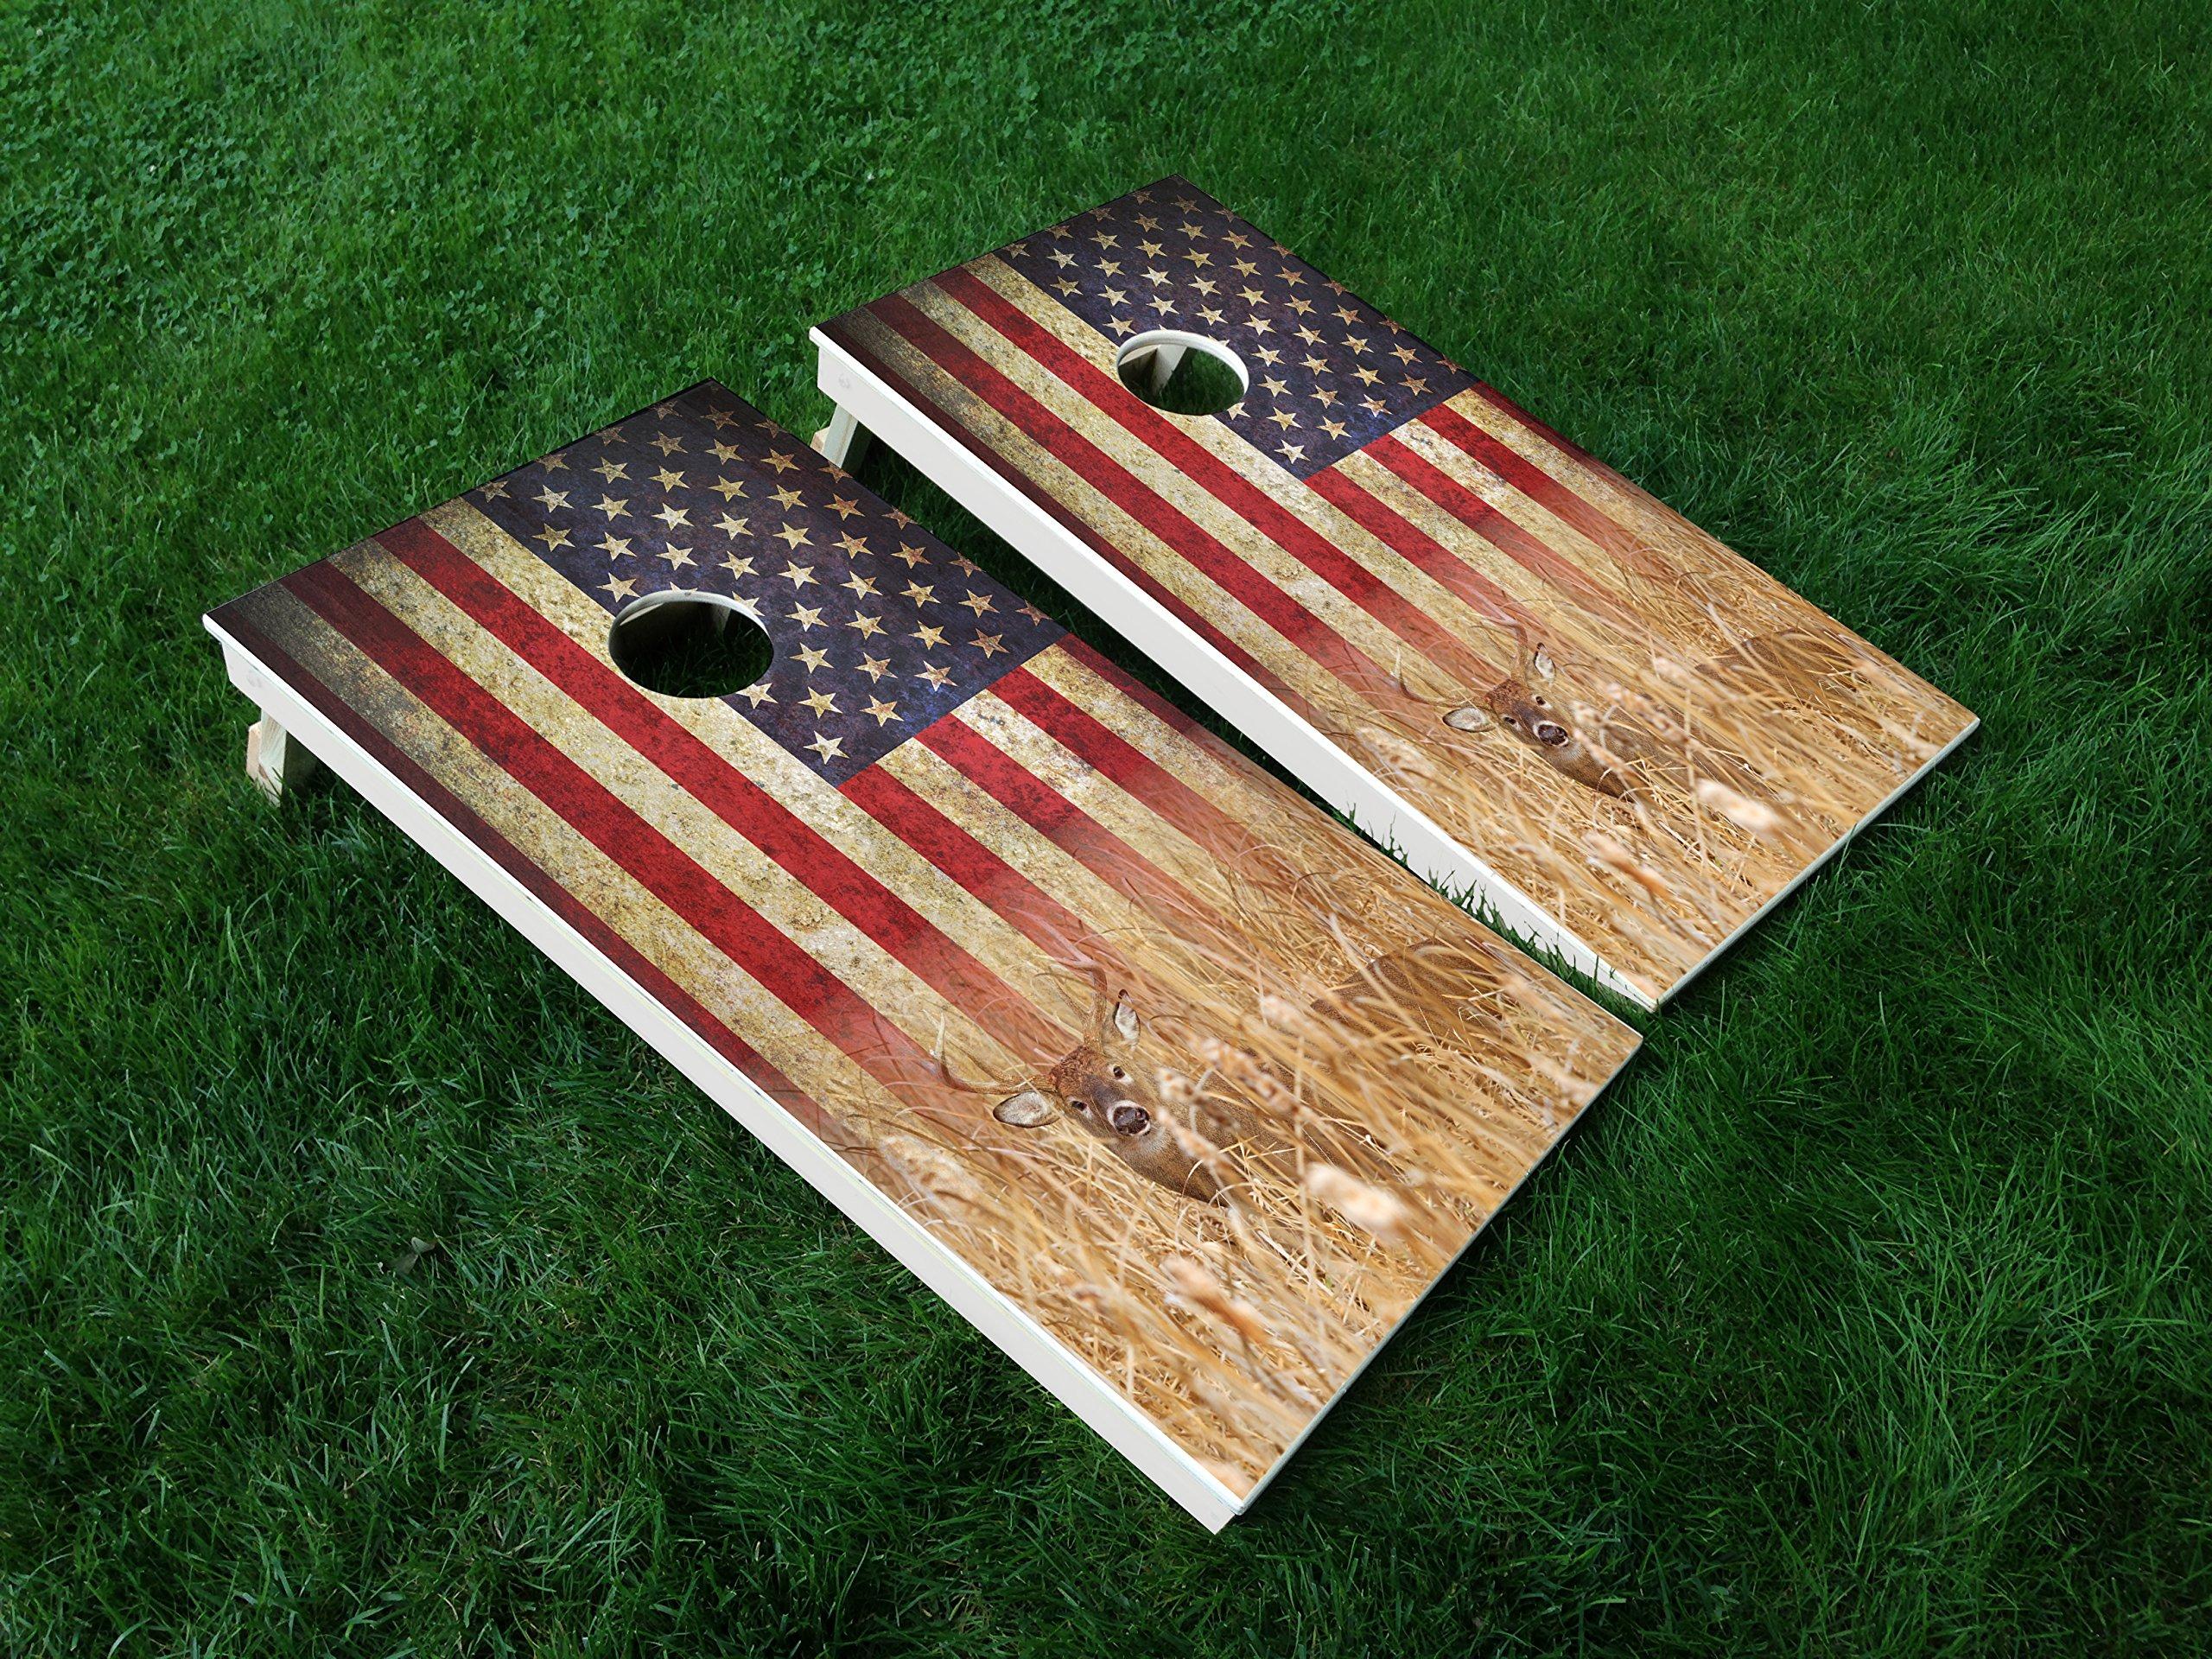 DISTRESSED AMERICA_Deer 01 USA FLAG Hunting CORNHOLE WRAP SET Vinyl Board DECAL Baggo Bag Toss Boards MADE IN the USA